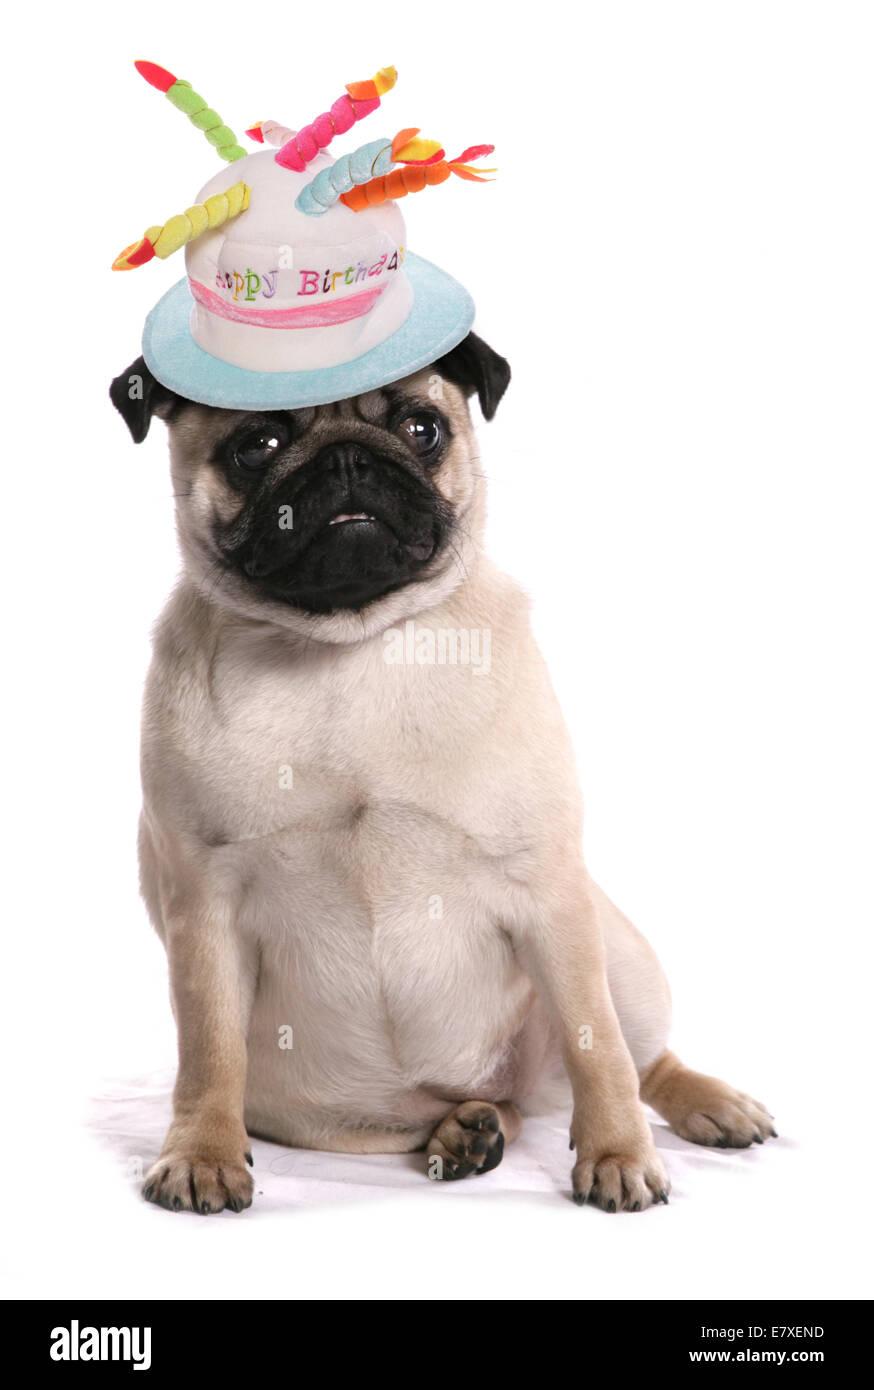 Mops Hund Tragen Geburtstag Hut Stockfoto Bild 73726393 Alamy